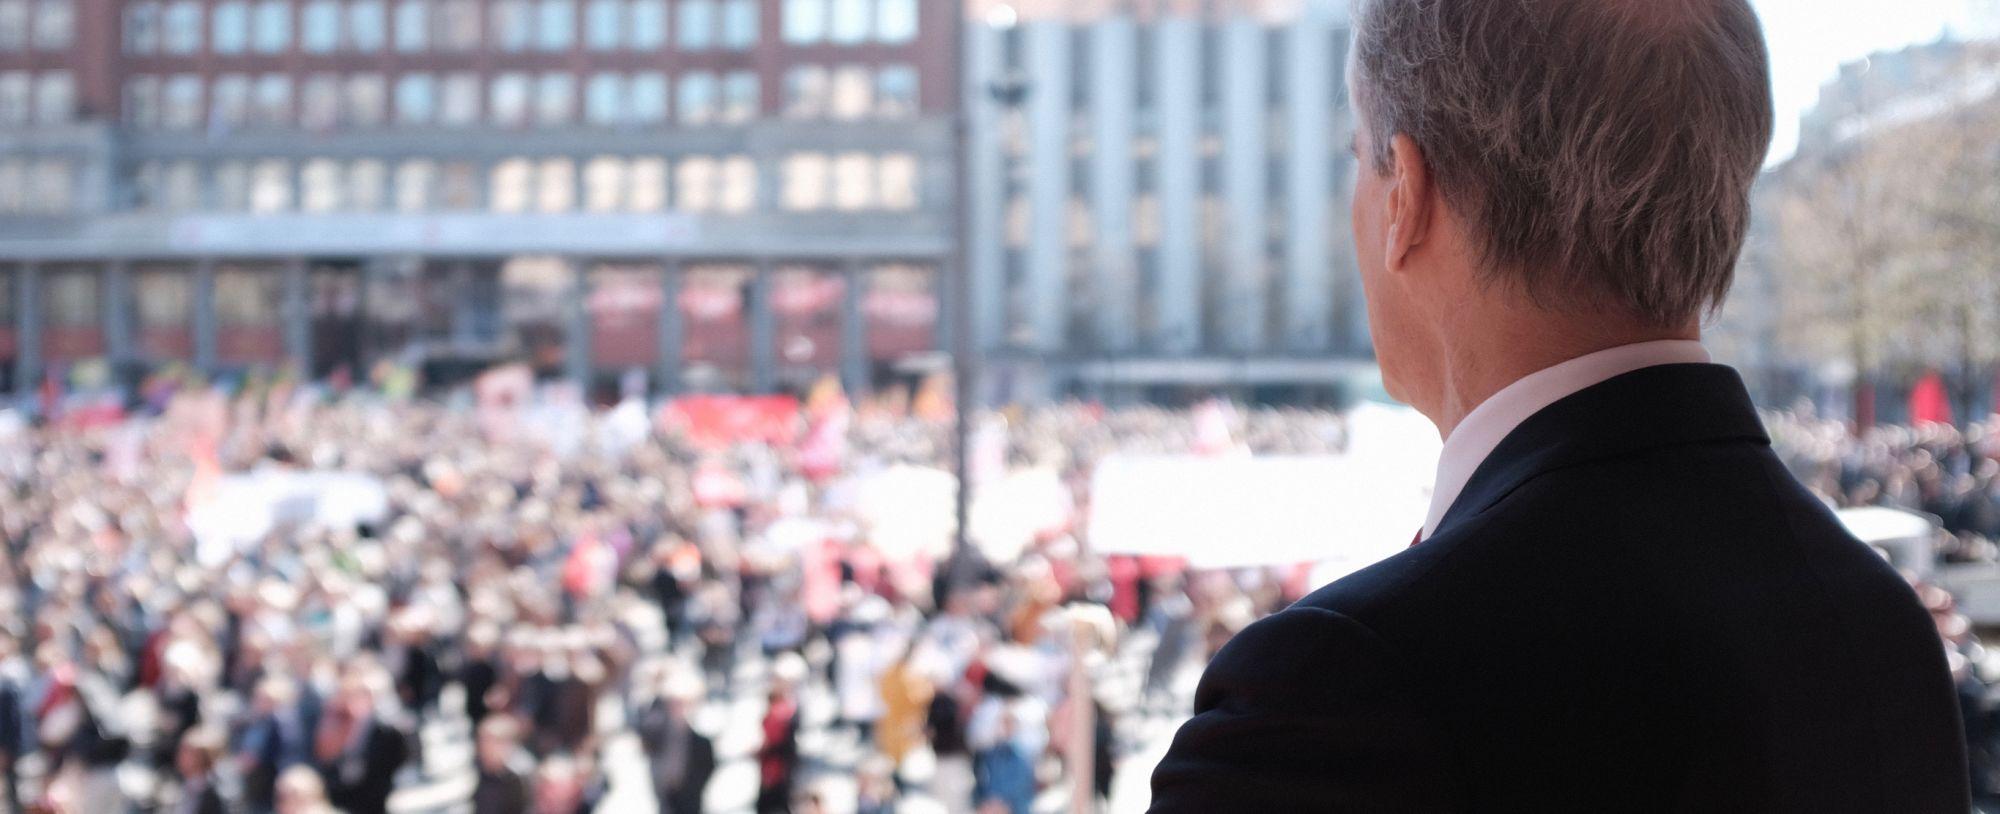 Jonas Gahr Støre bakfra med utsikt over Youngstorget mens han holder 1. mai-tale. Mange mennesker står nede på torget.